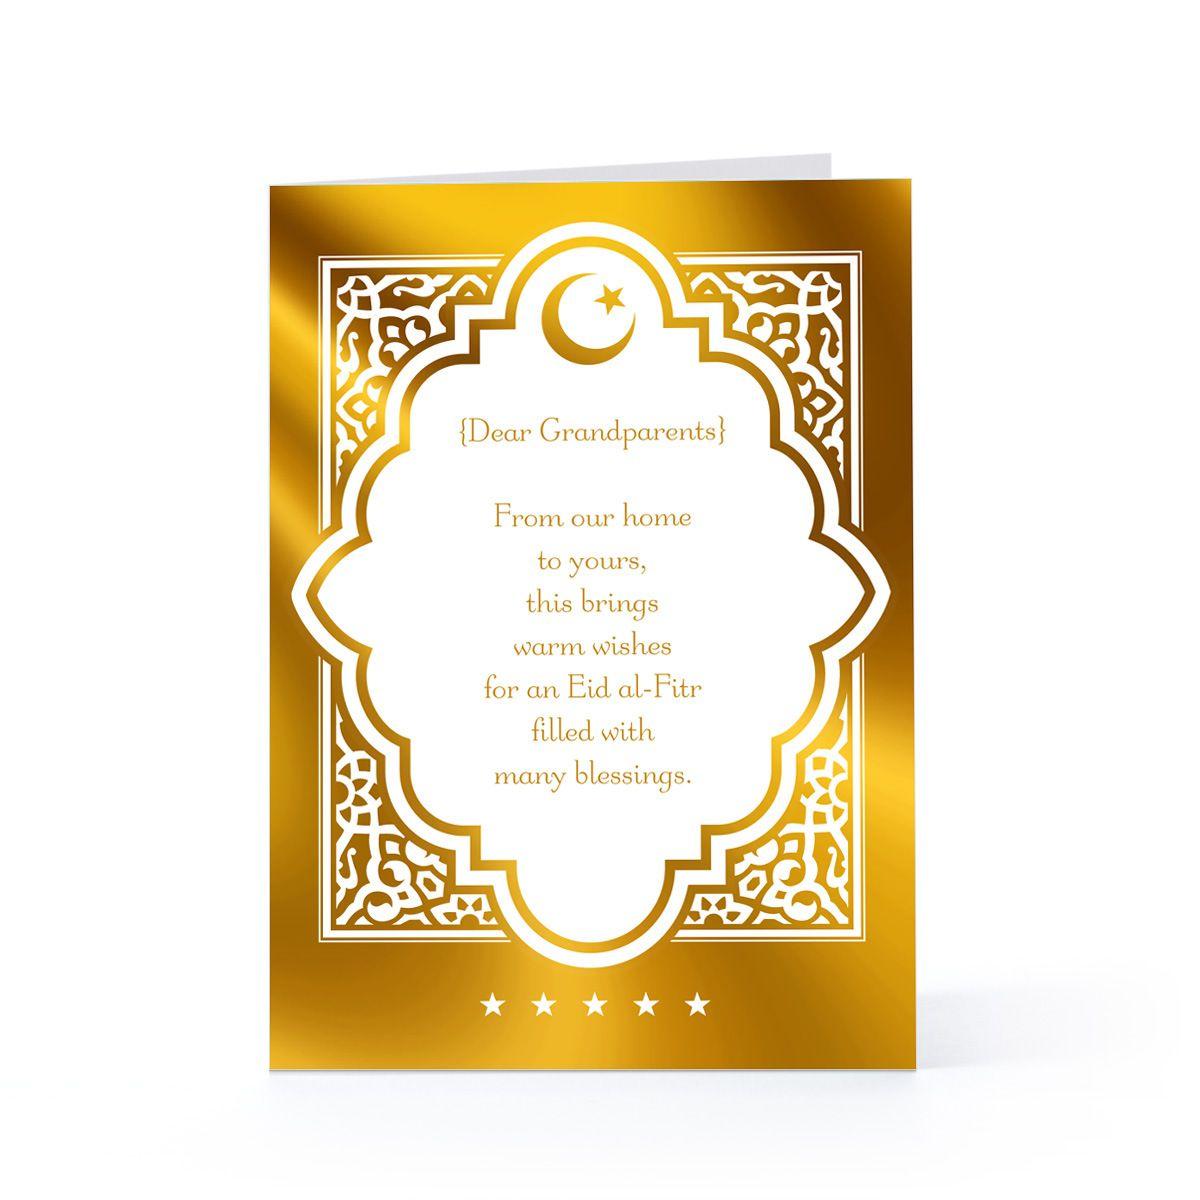 Free Greeting Cards Printable Hallmark. Blessed Eid Alfitr Eid - Free Hallmark Christmas Cards Printable